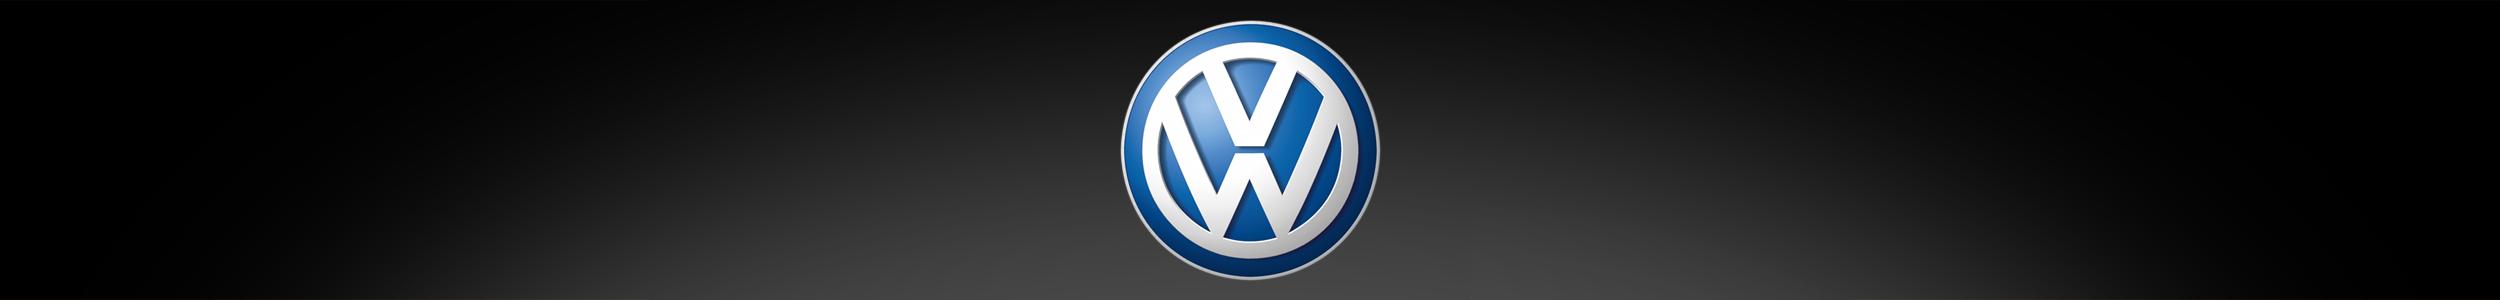 MB Lock & Key Auto Locksmiths | Volkswagen Car Keys - Reprogrammed or Replaced in Norwich, Norfolk